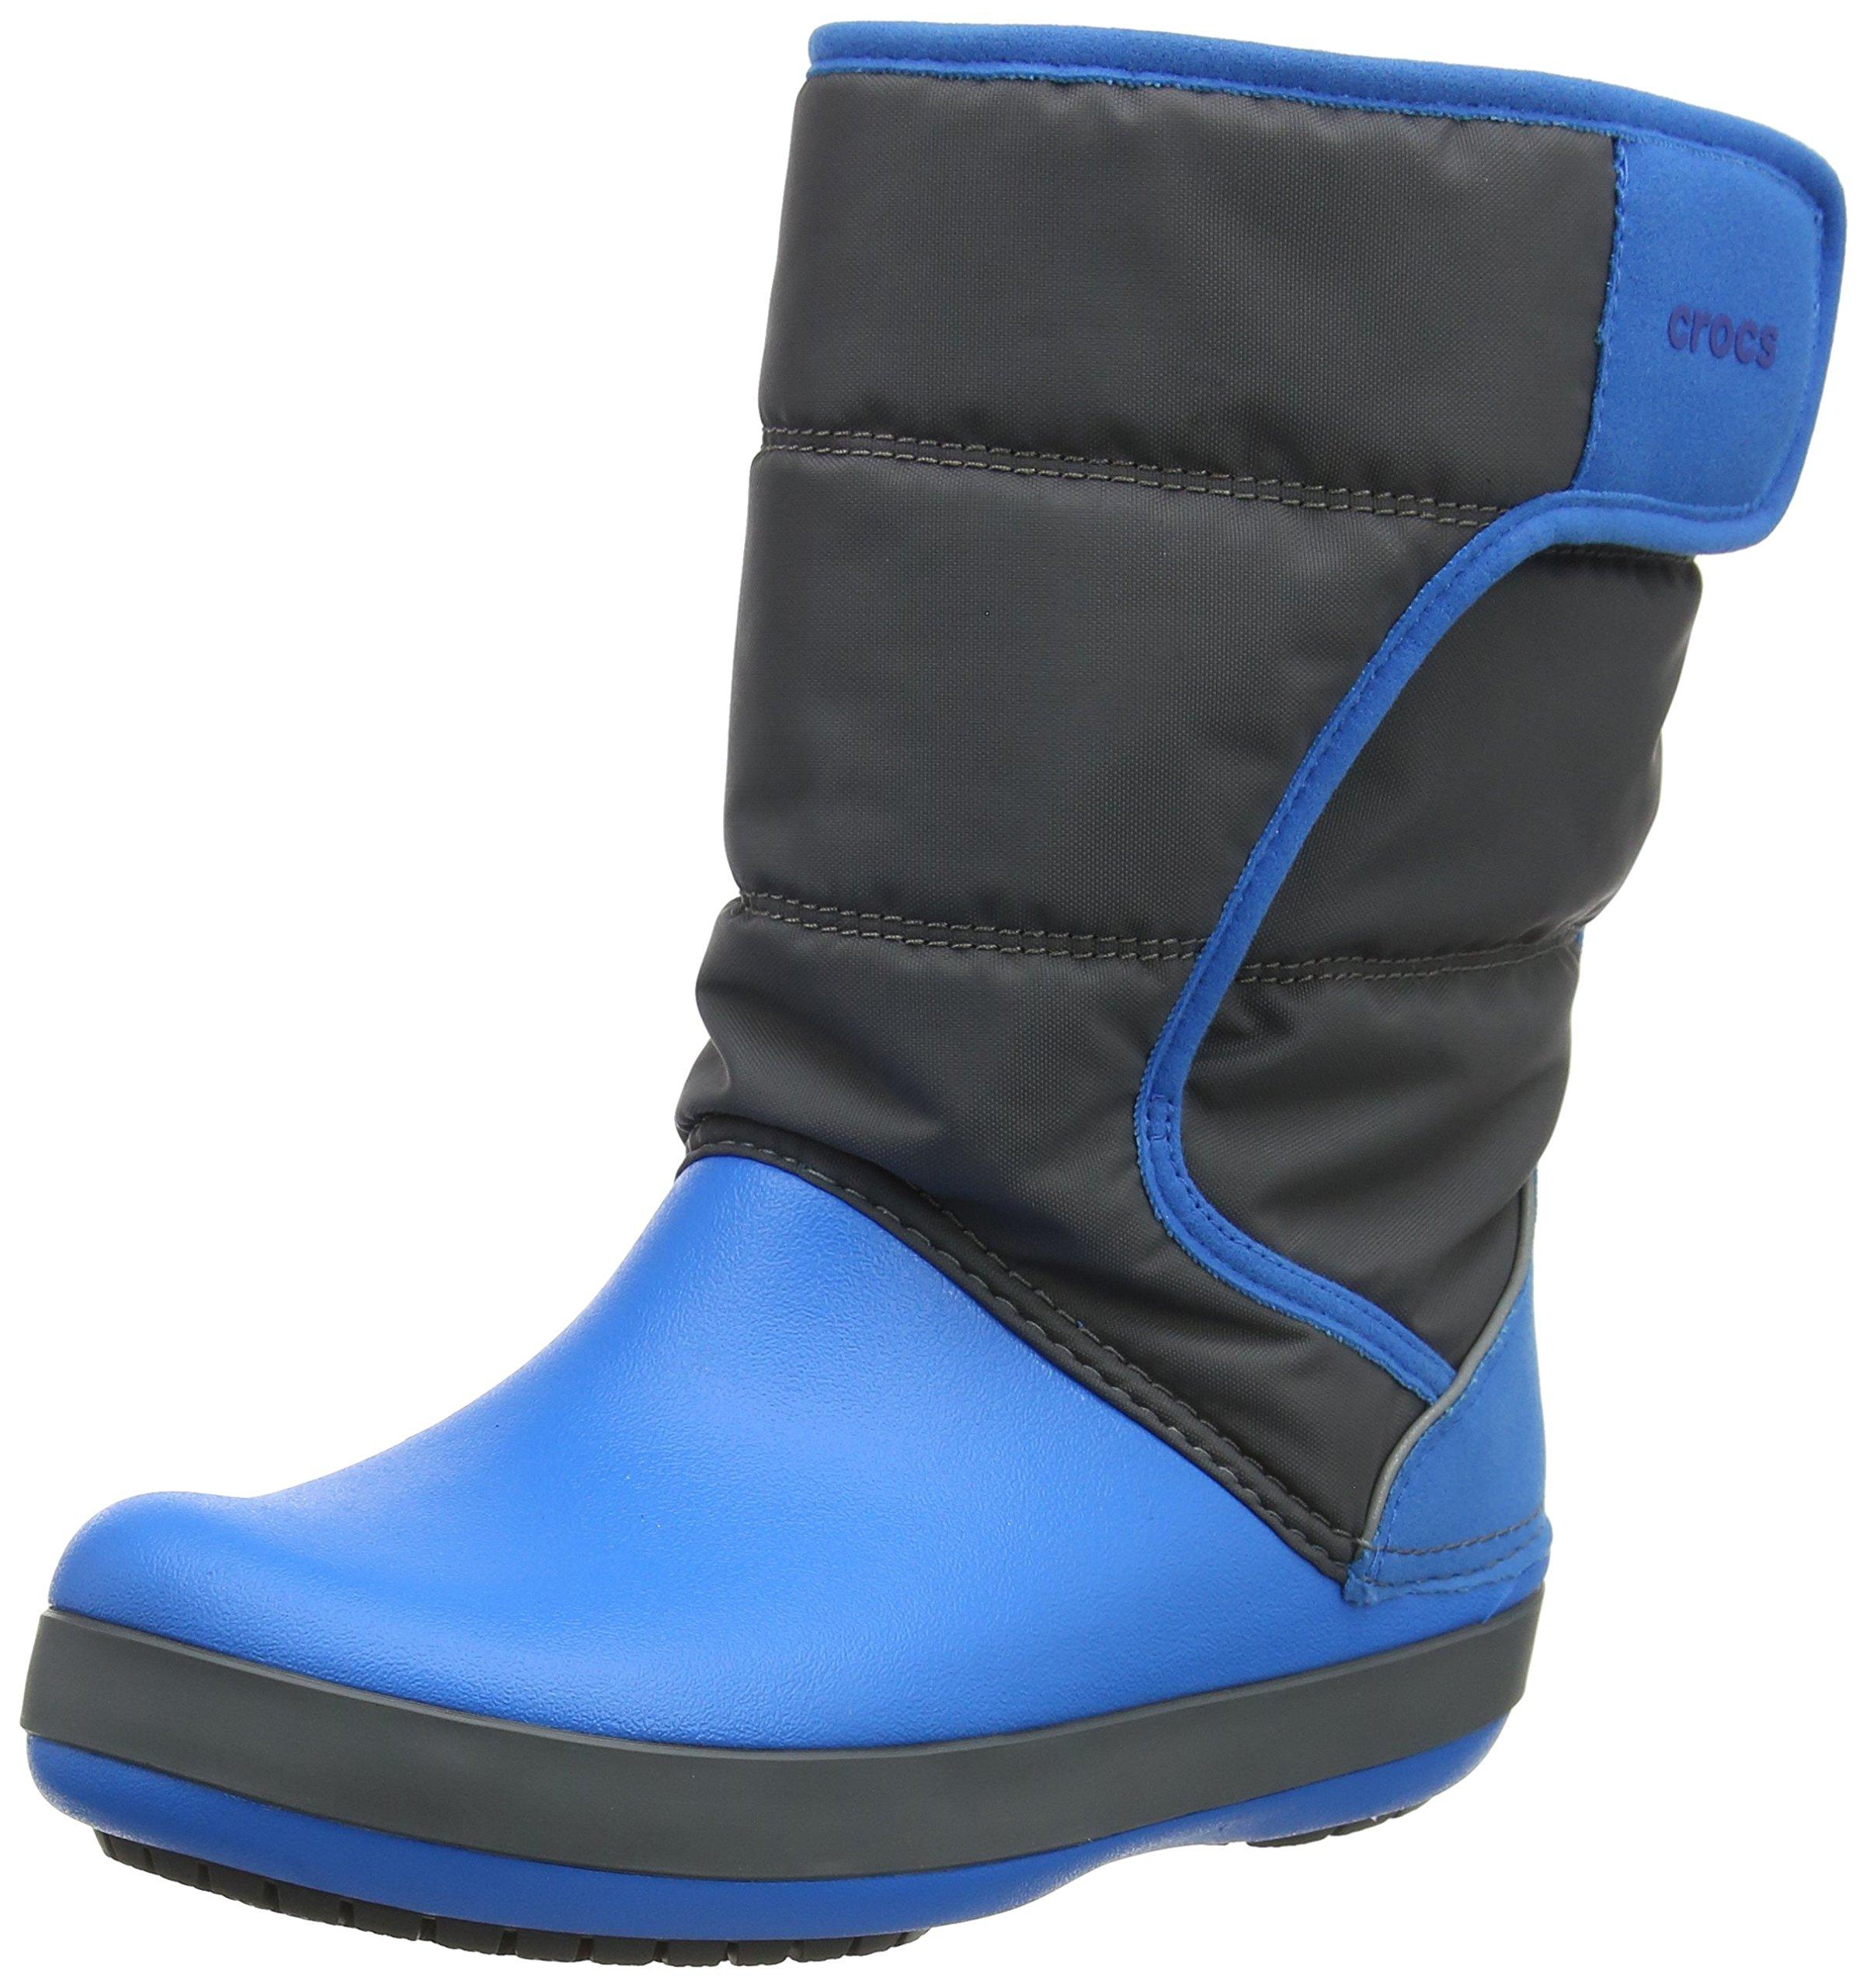 Crocs Lodge Point Snow Boot, Slate Grey/Ocean, 5 M US Big Kid